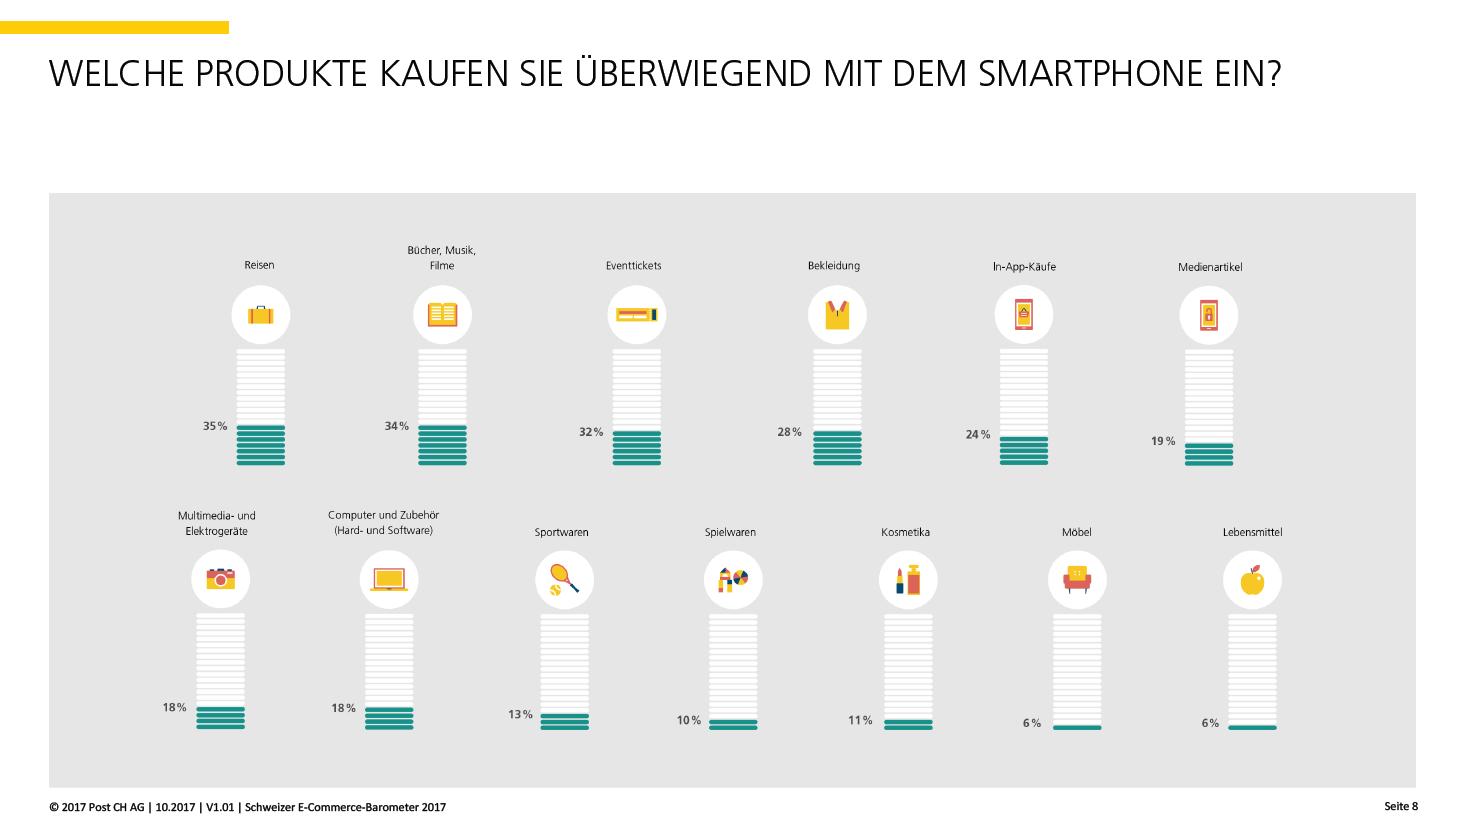 Quelle: 2017 Post CH AG | 10.2017 | V1.01 | Schweizer E-Commerce Stimmungsbarometer 2017, S.8